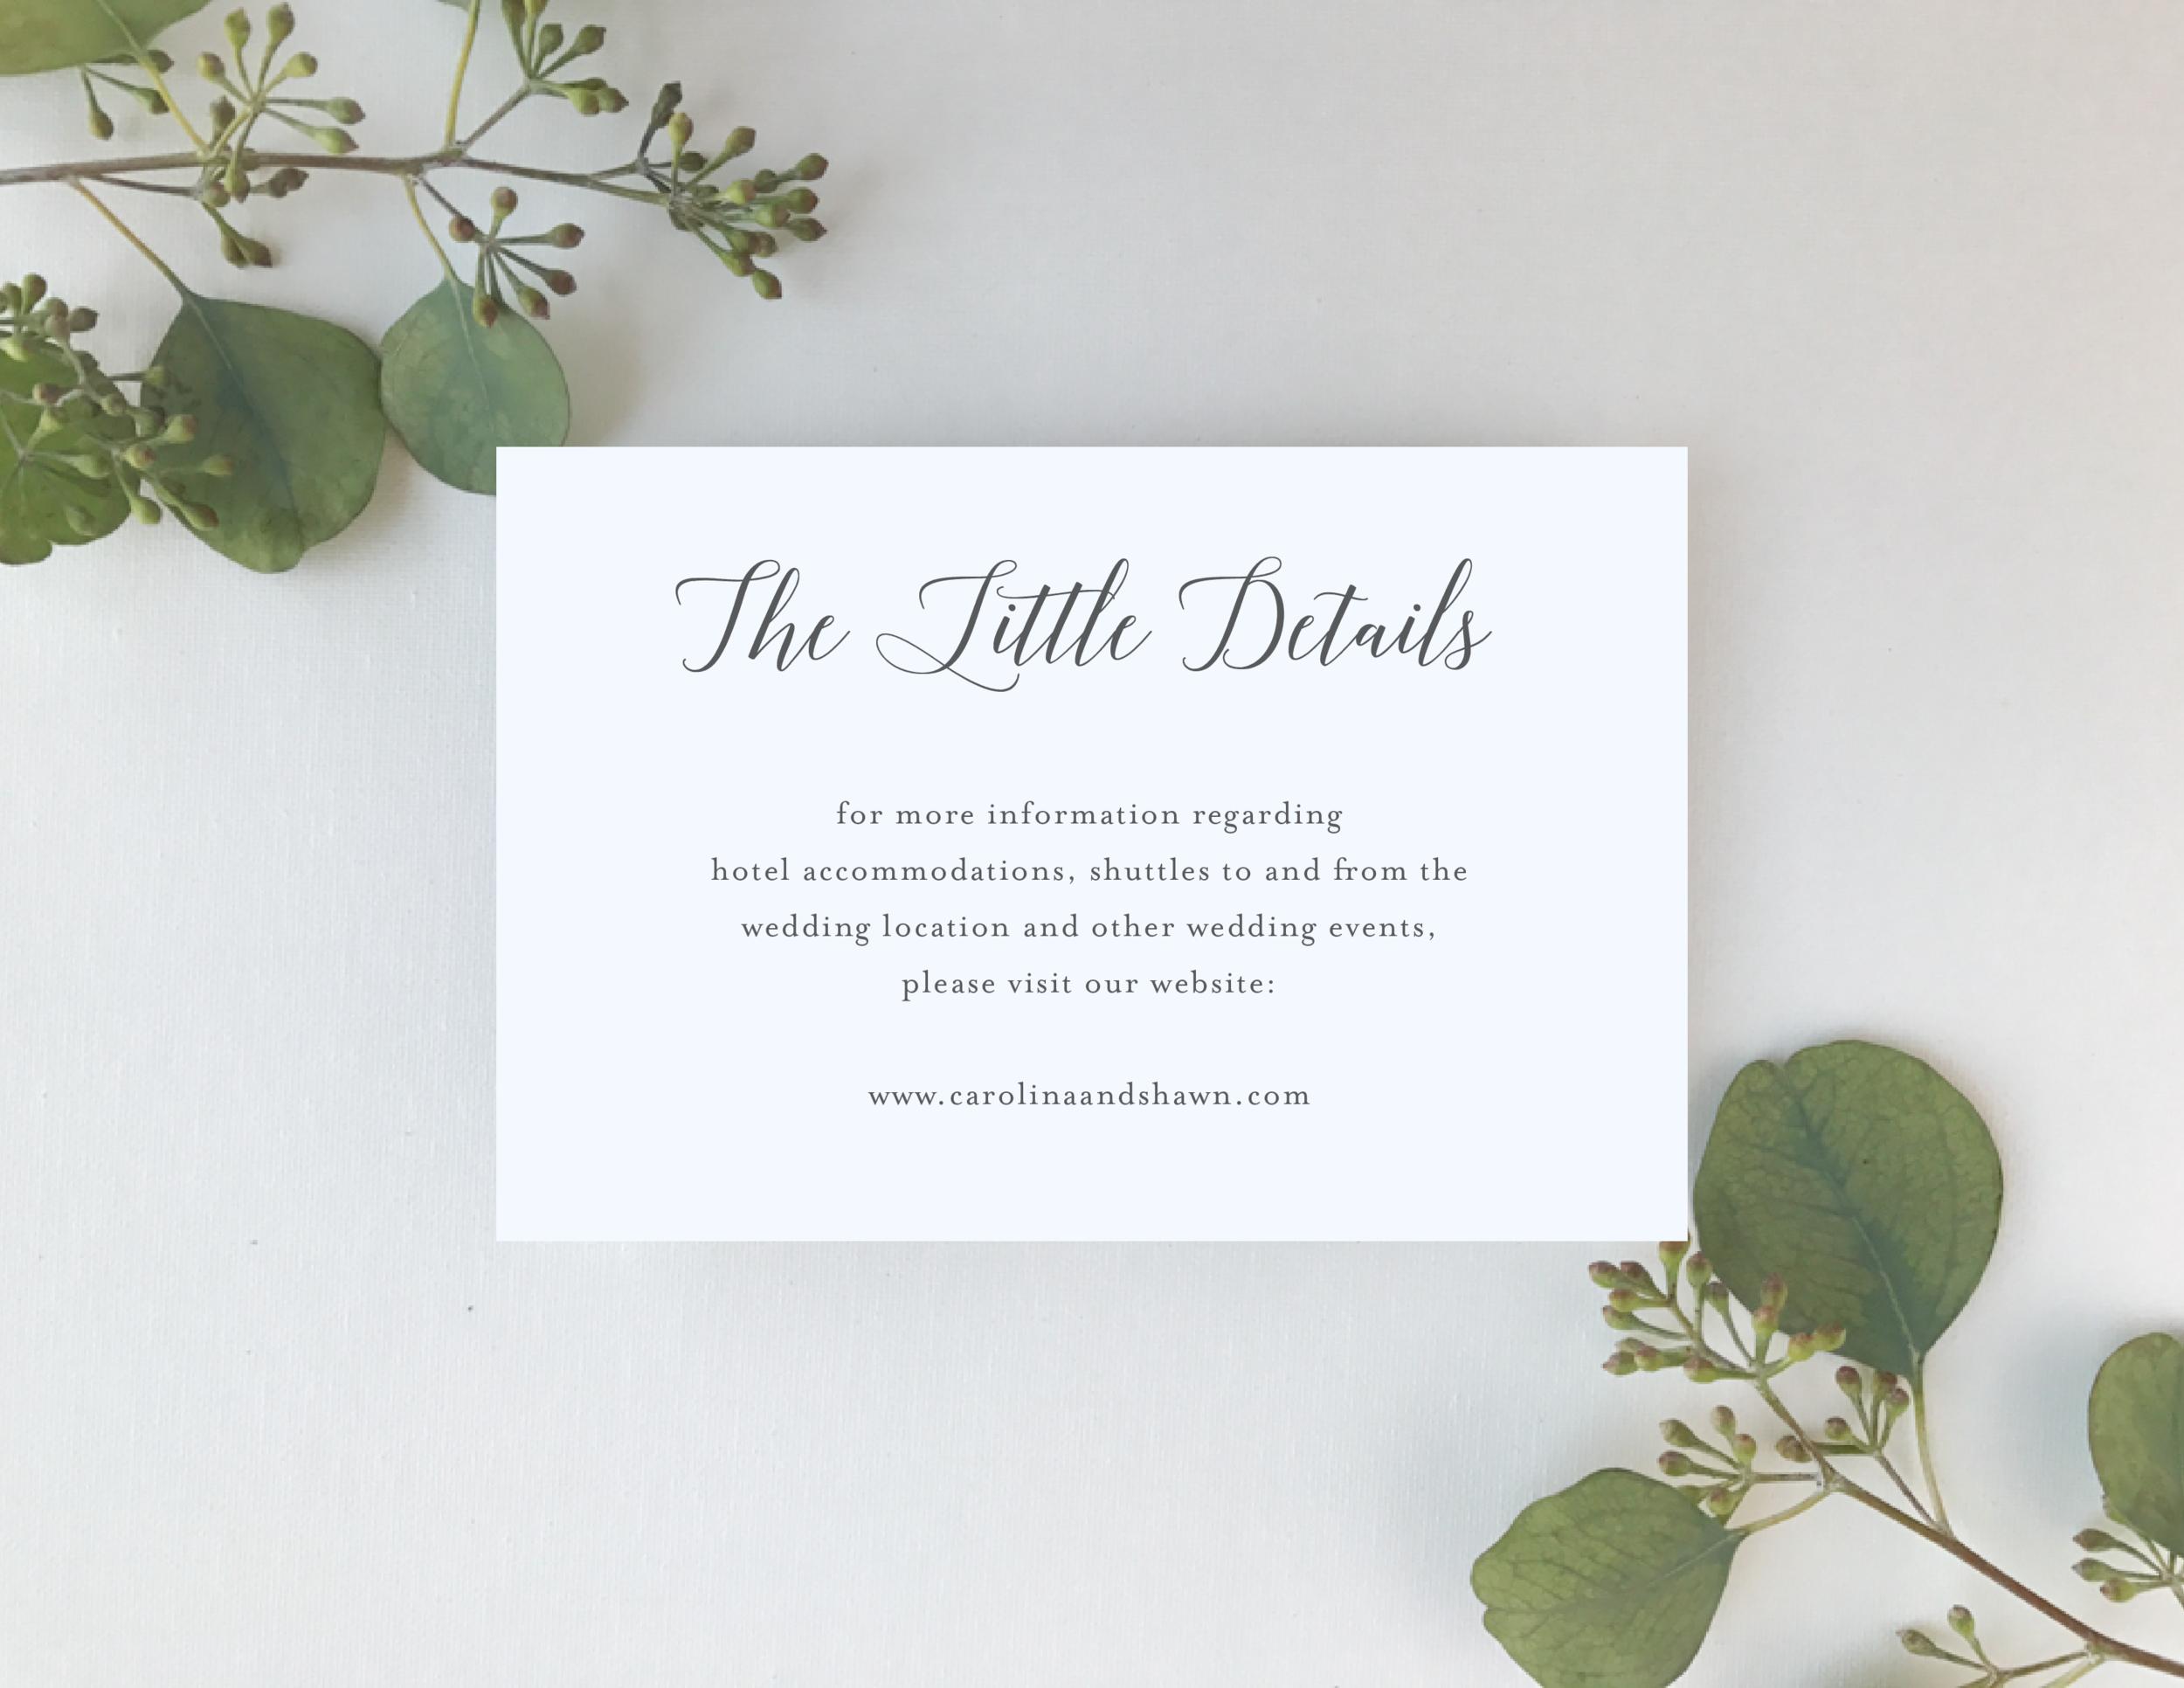 Elegant Calligraphy Wedding Invitation by Just Jurf